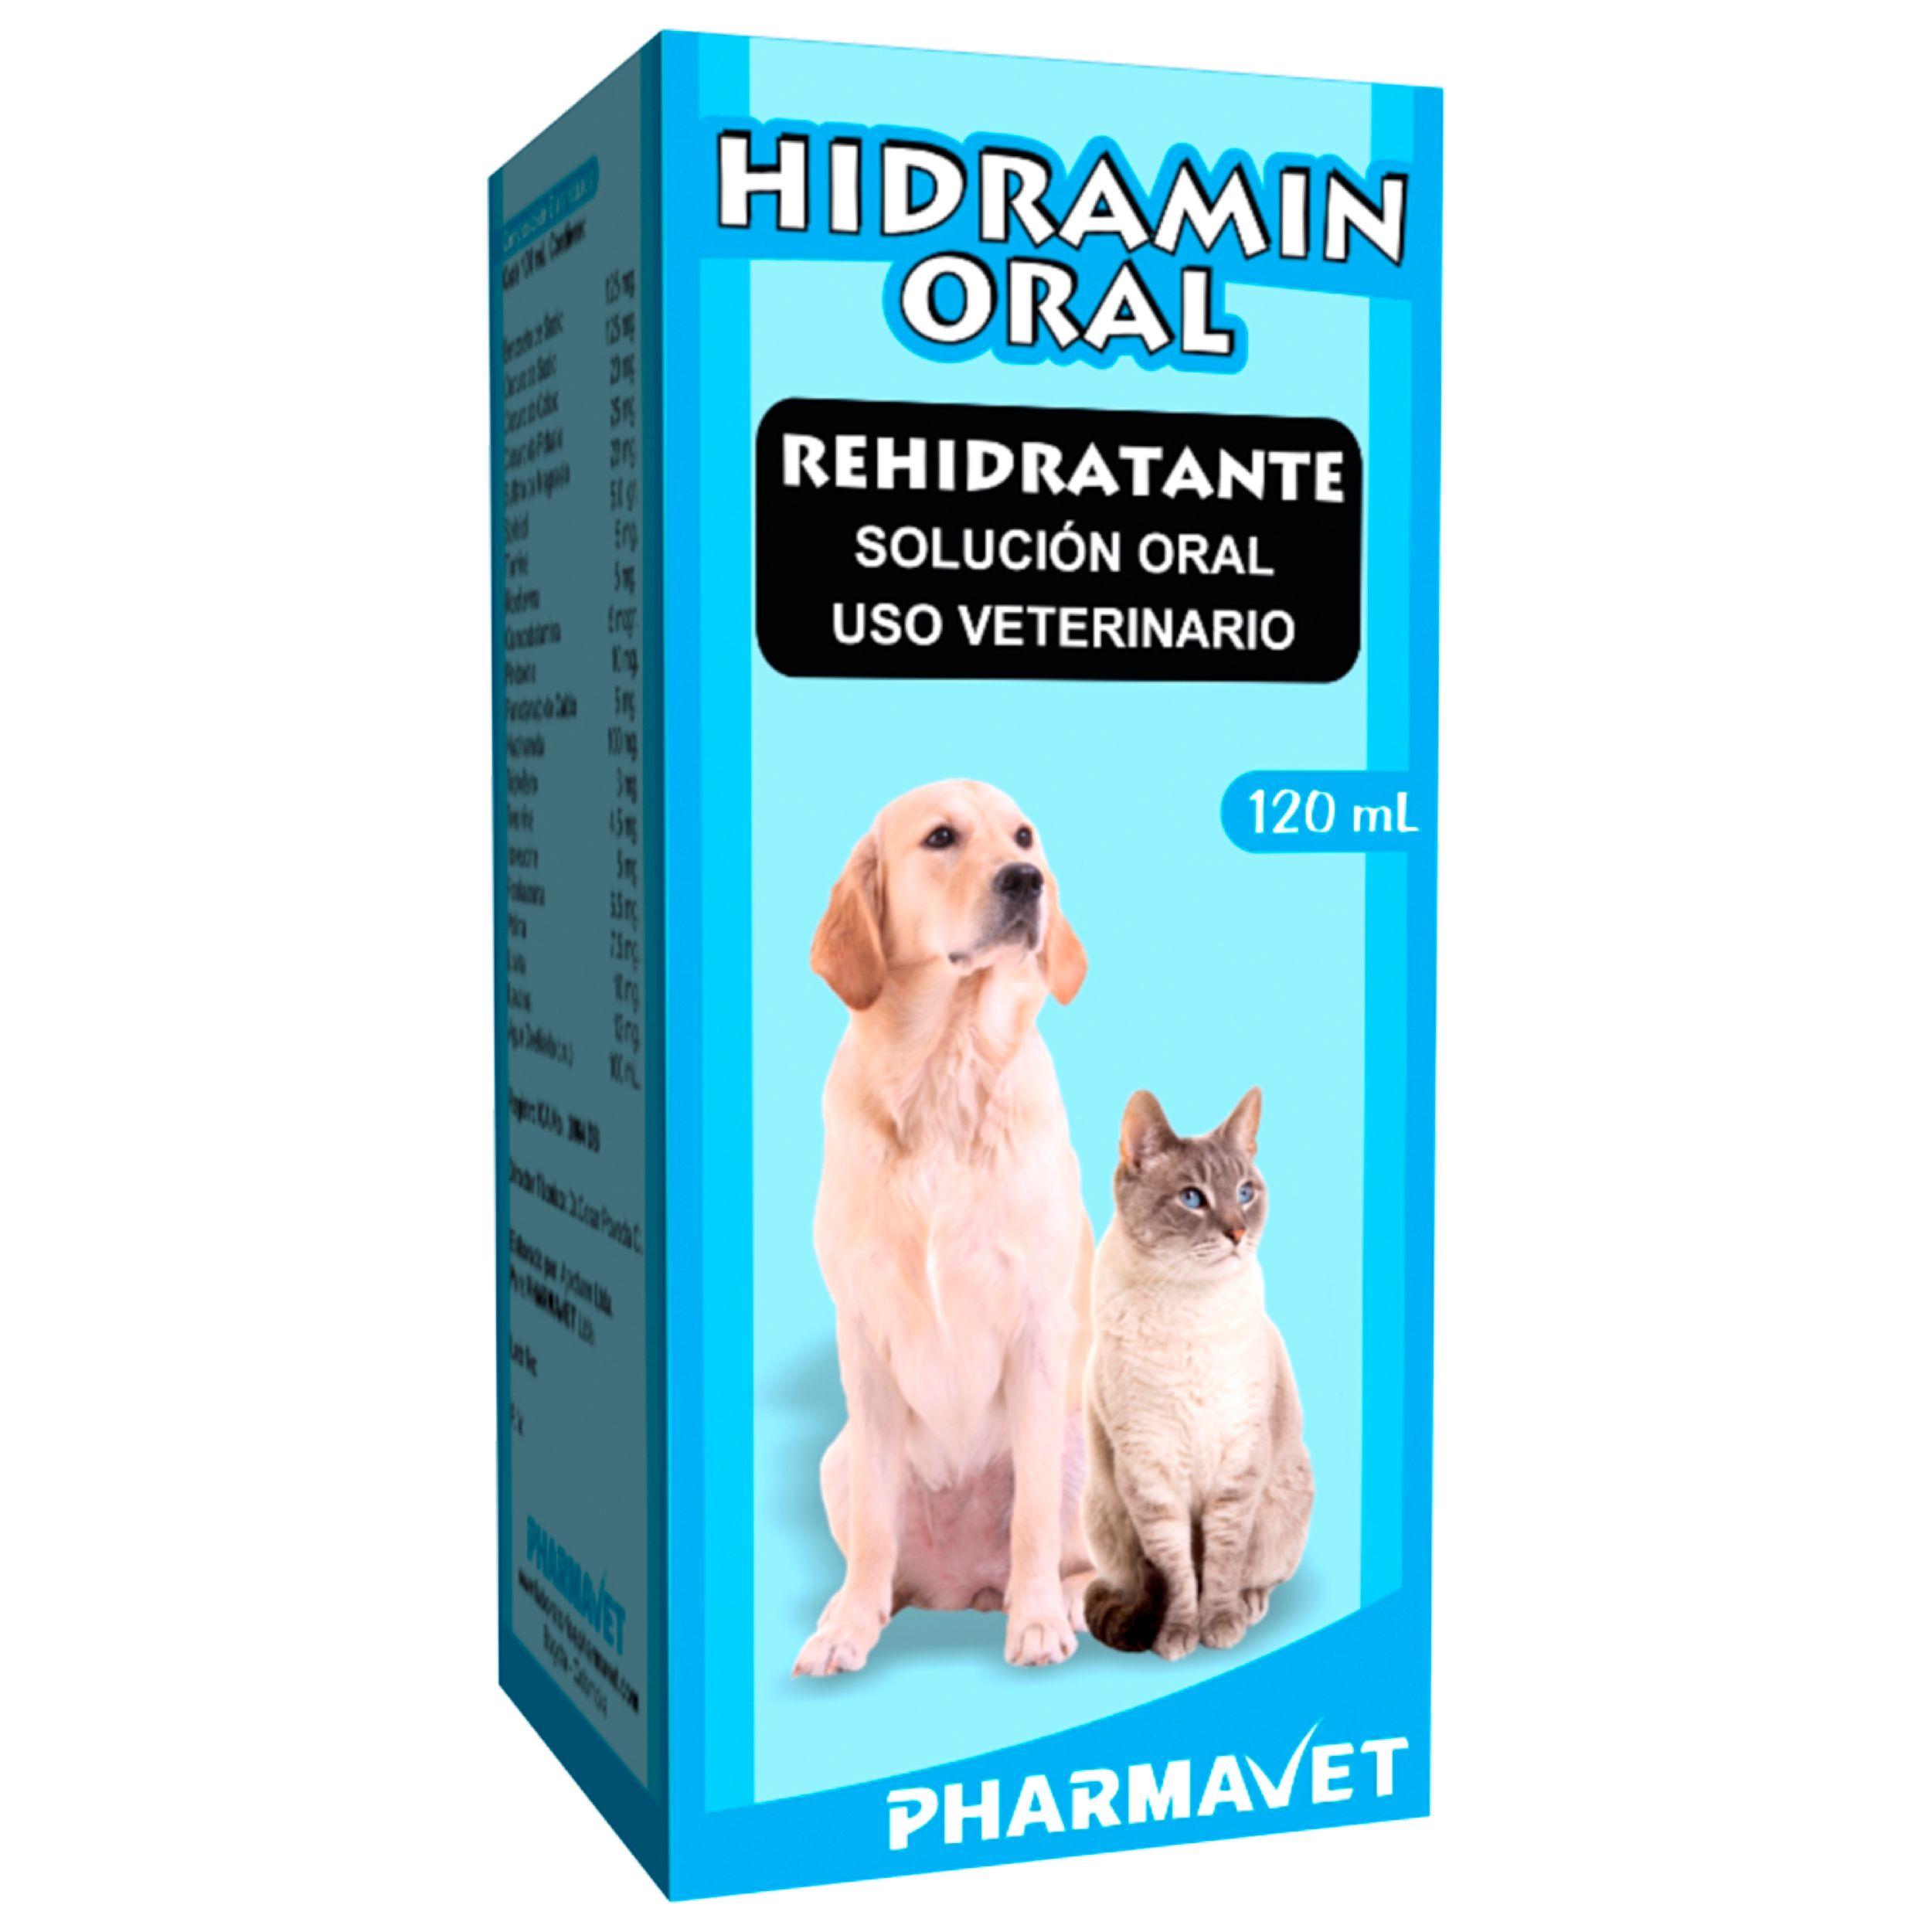 Hidramin Oral.jpg